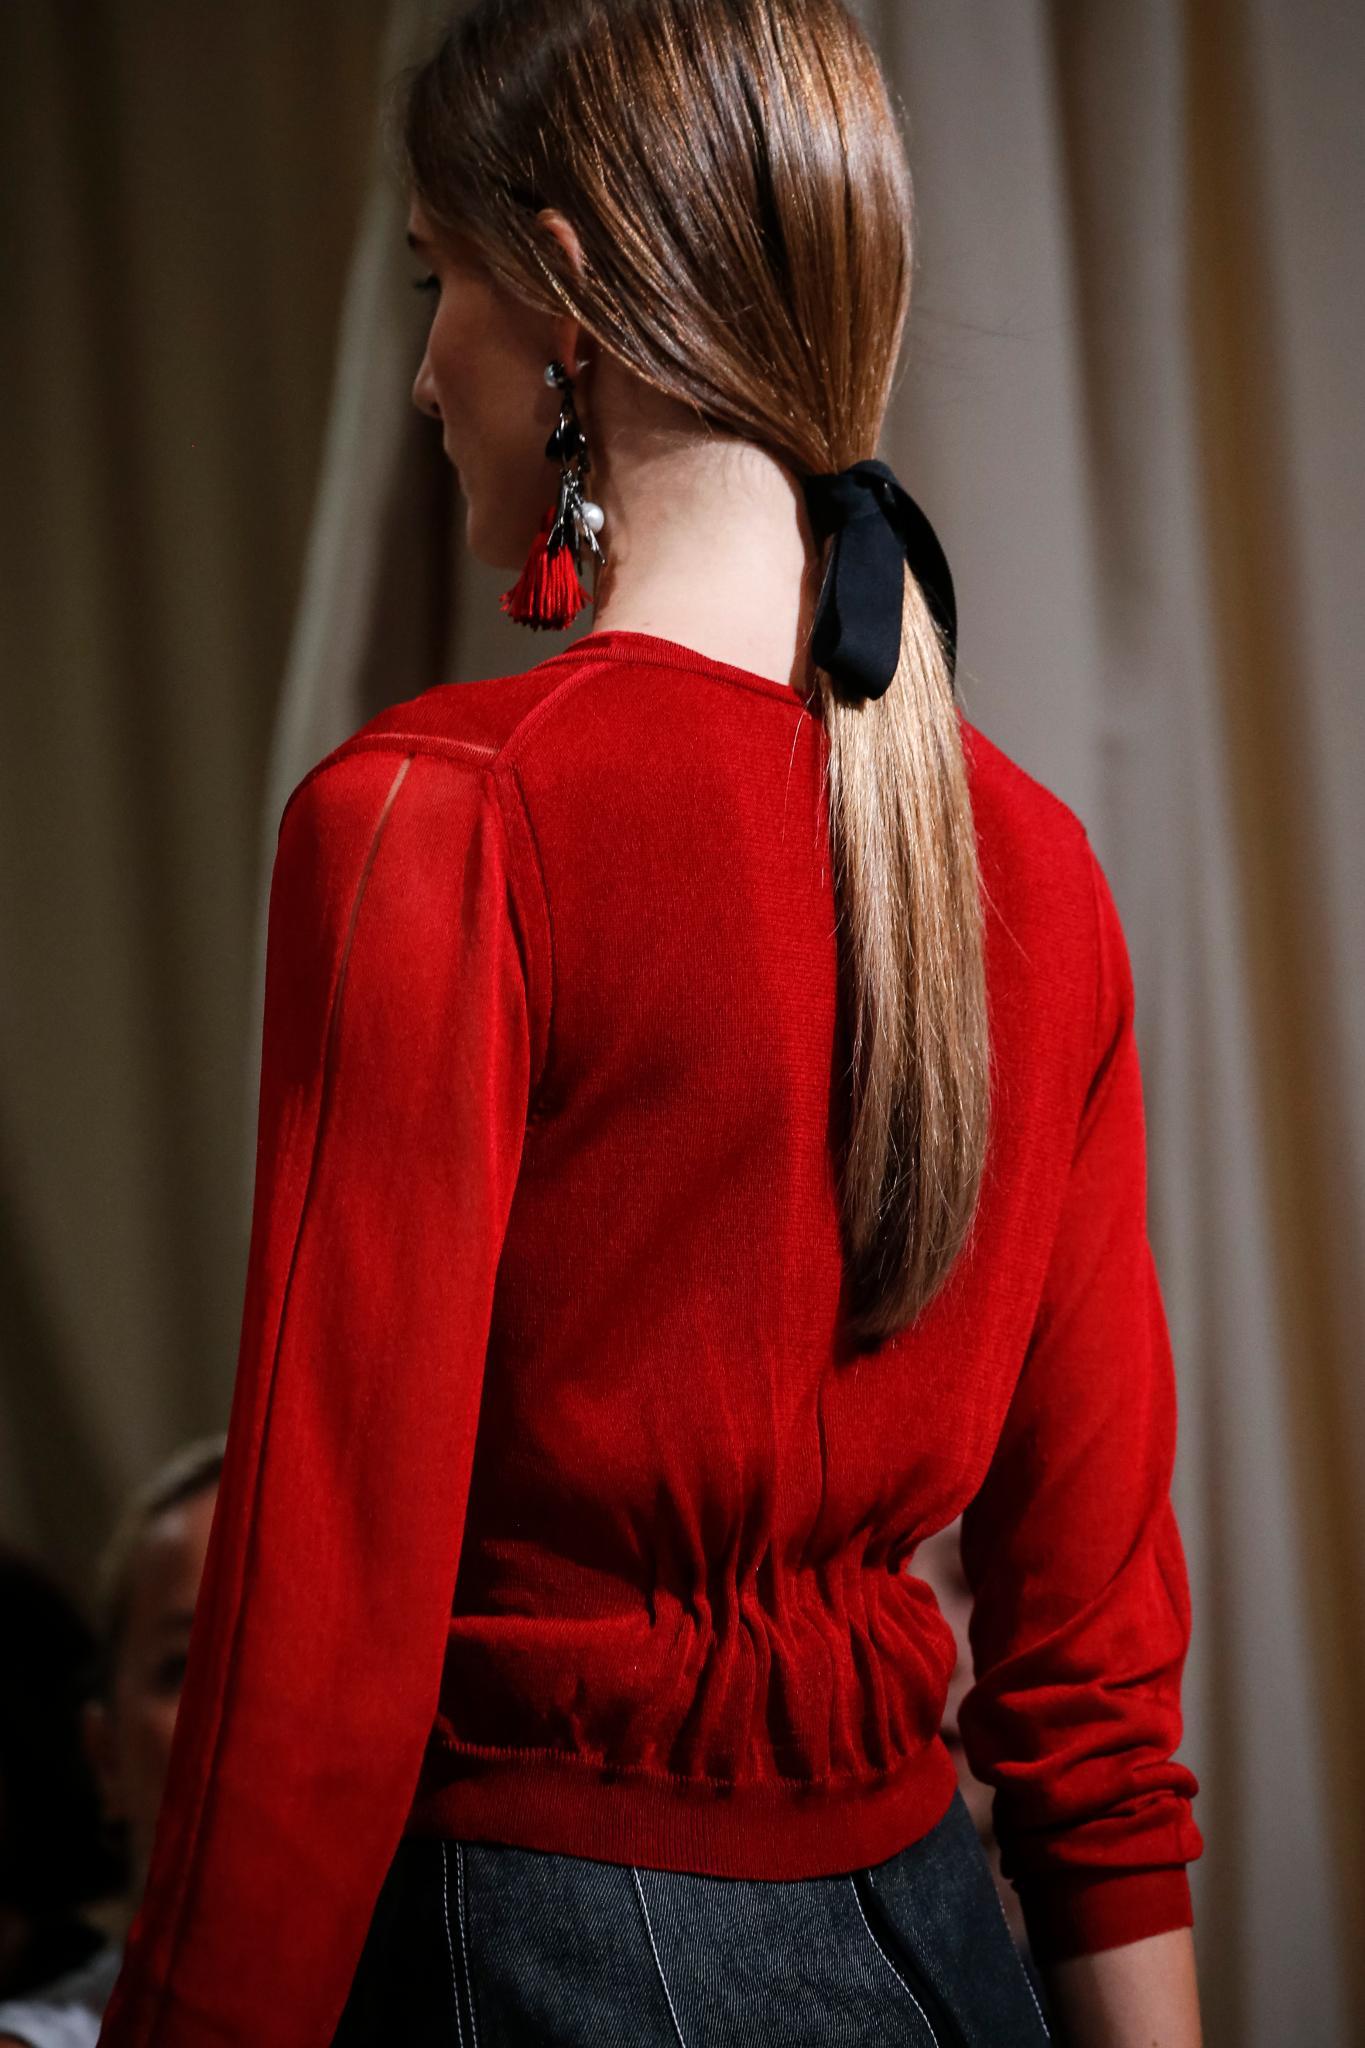 Mujer vista desde atrás, cabellera lacia, rubia con coleta baja atada con un lazo negro